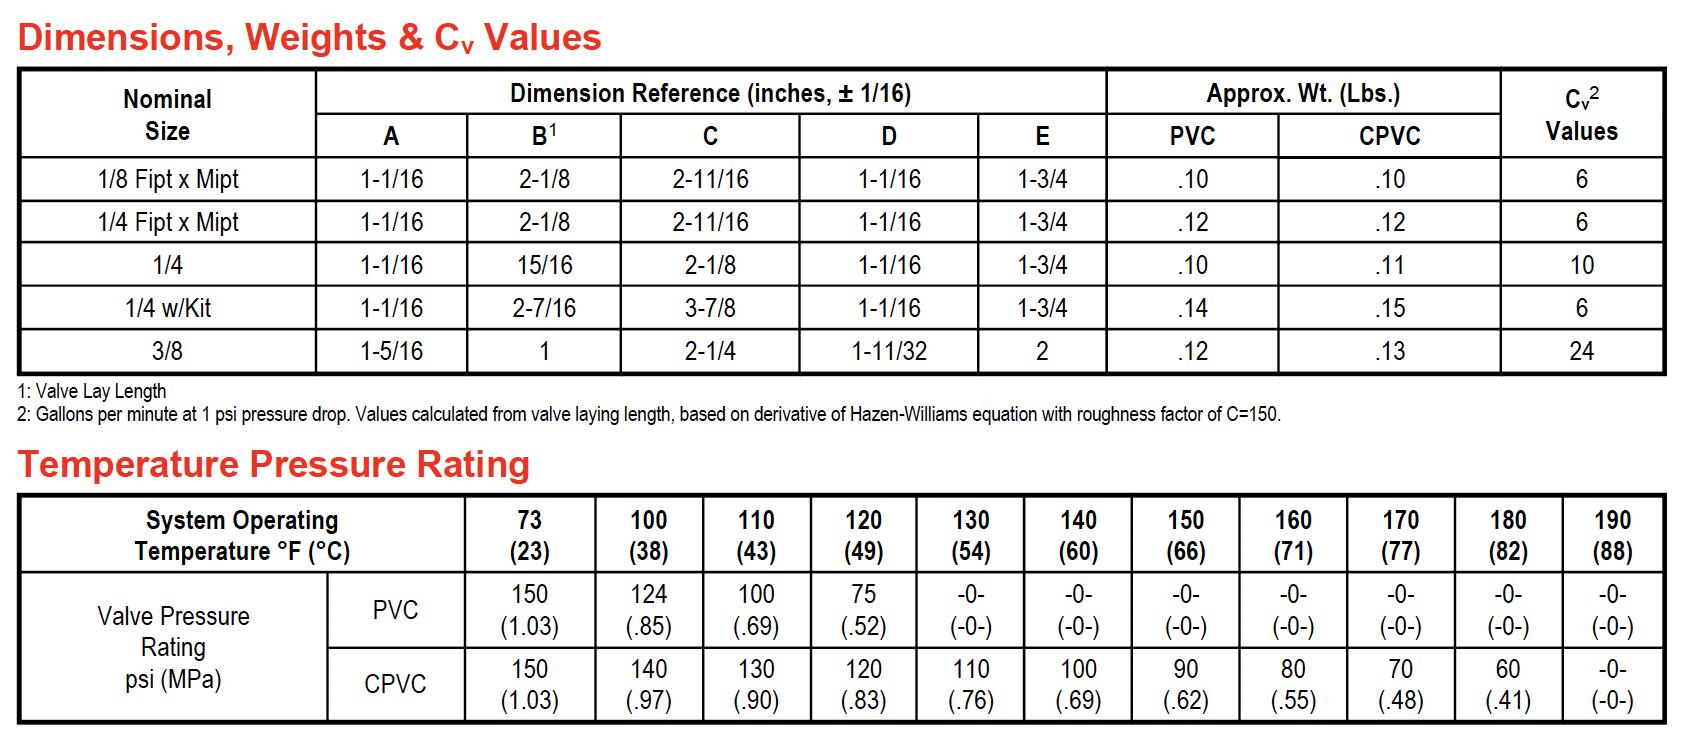 Dimensions, Weights & Cv Values. Temperature Pressure Ratting.